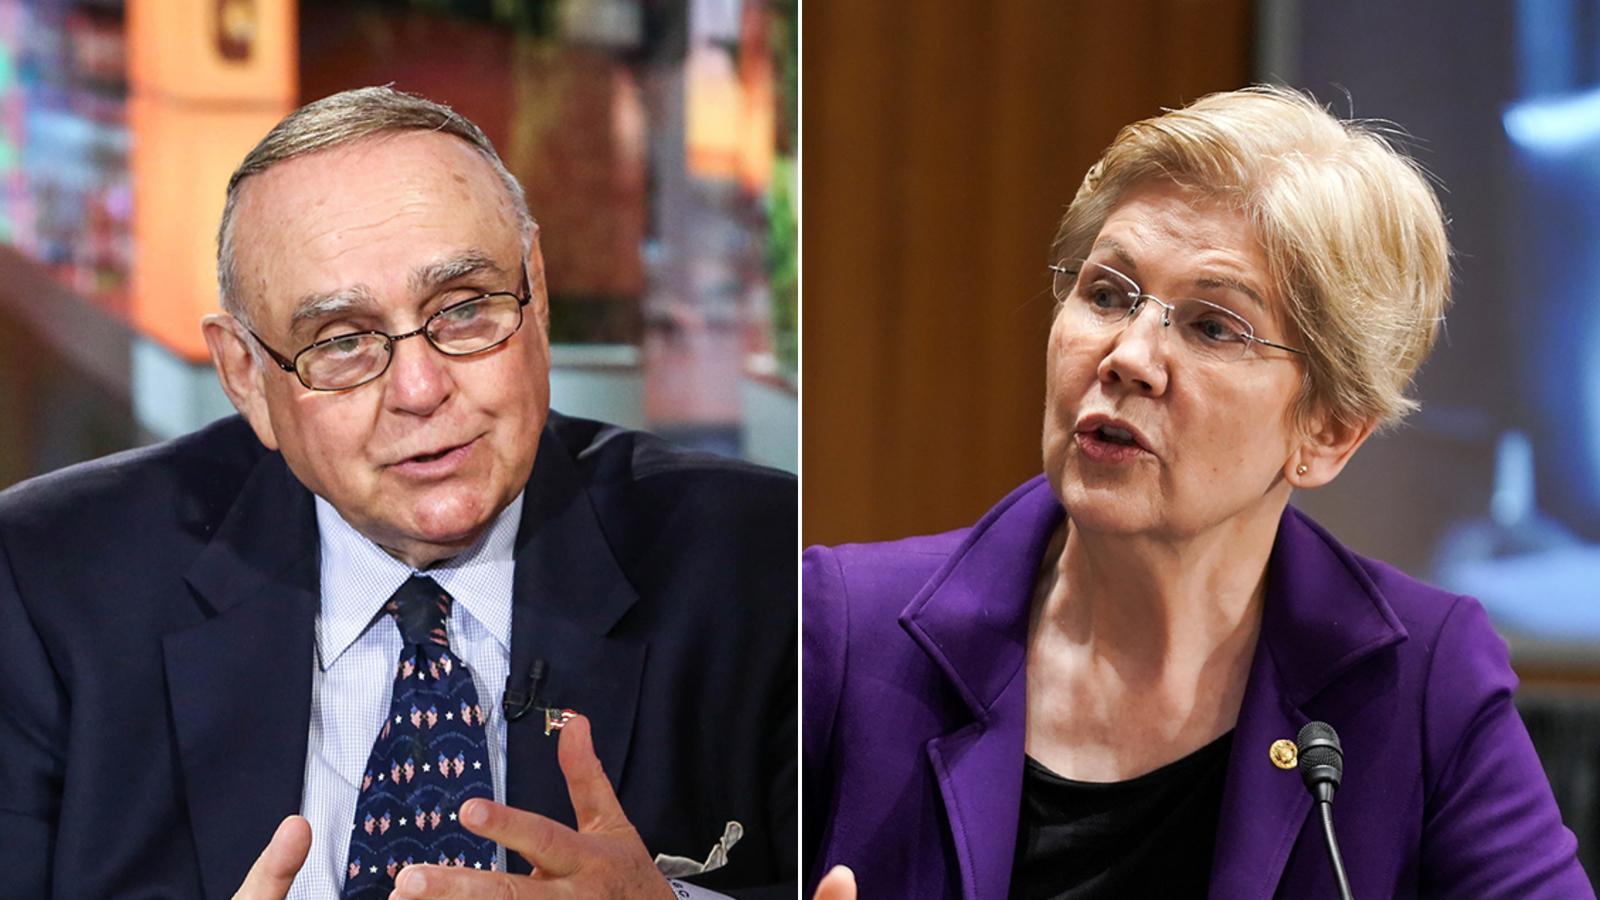 Billionaire turns down Elizabeth Warren's offer to testify on her wealth tax